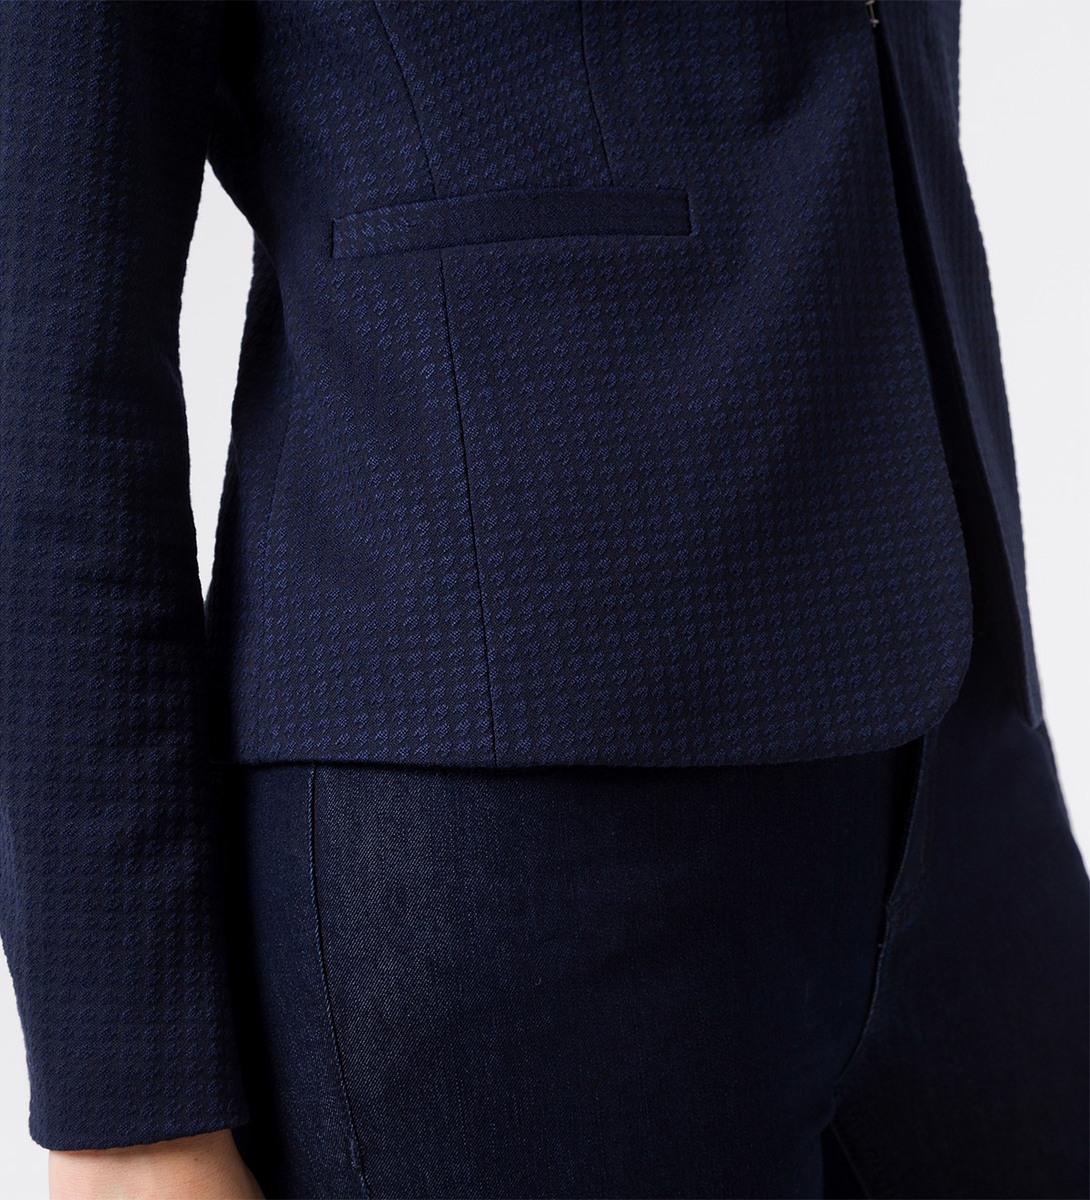 Blazer mit Strukturmuster in blue black